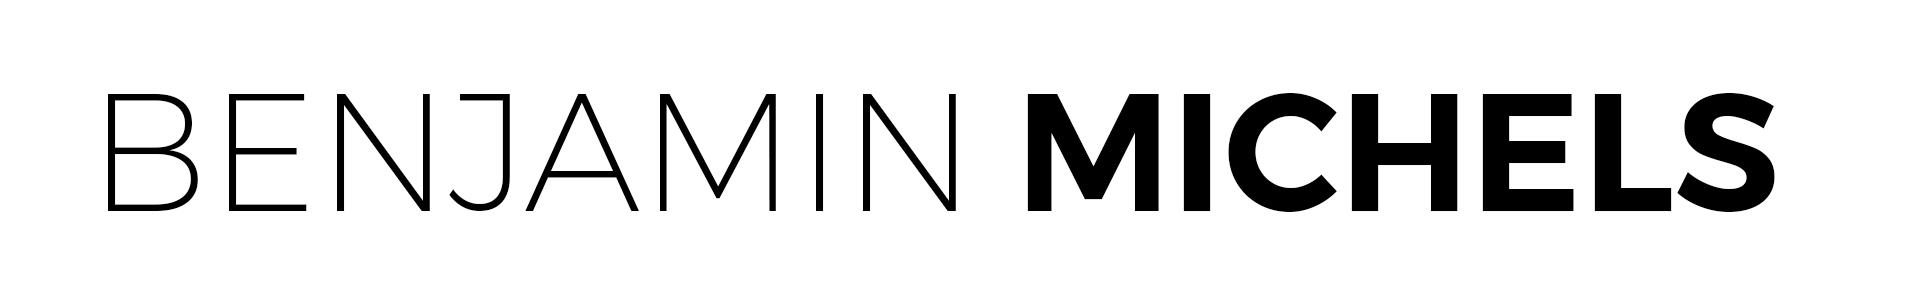 Benjamin Michels - Masterclass